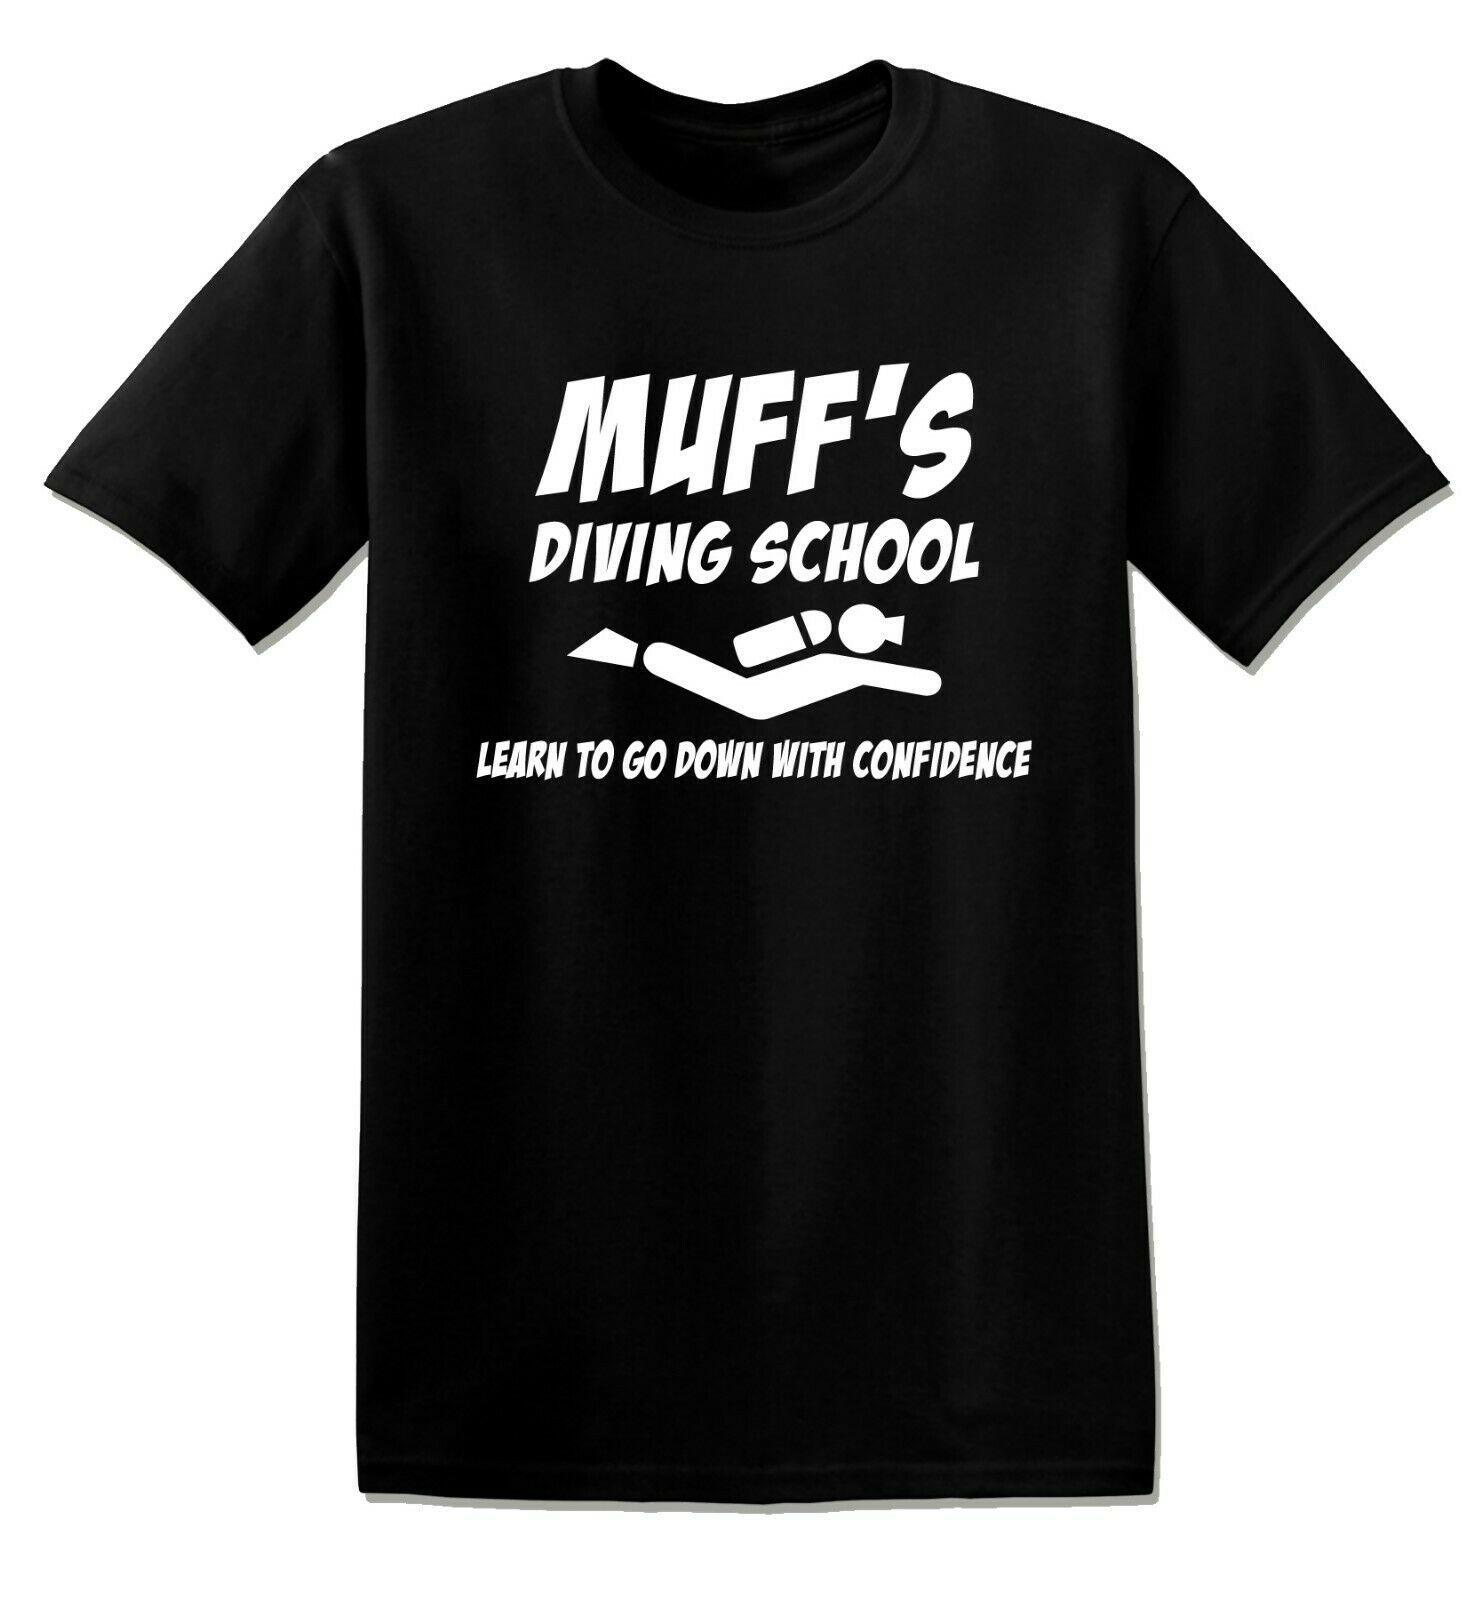 Muff Diving School Funny Offensive Rude Shirt T-shirt